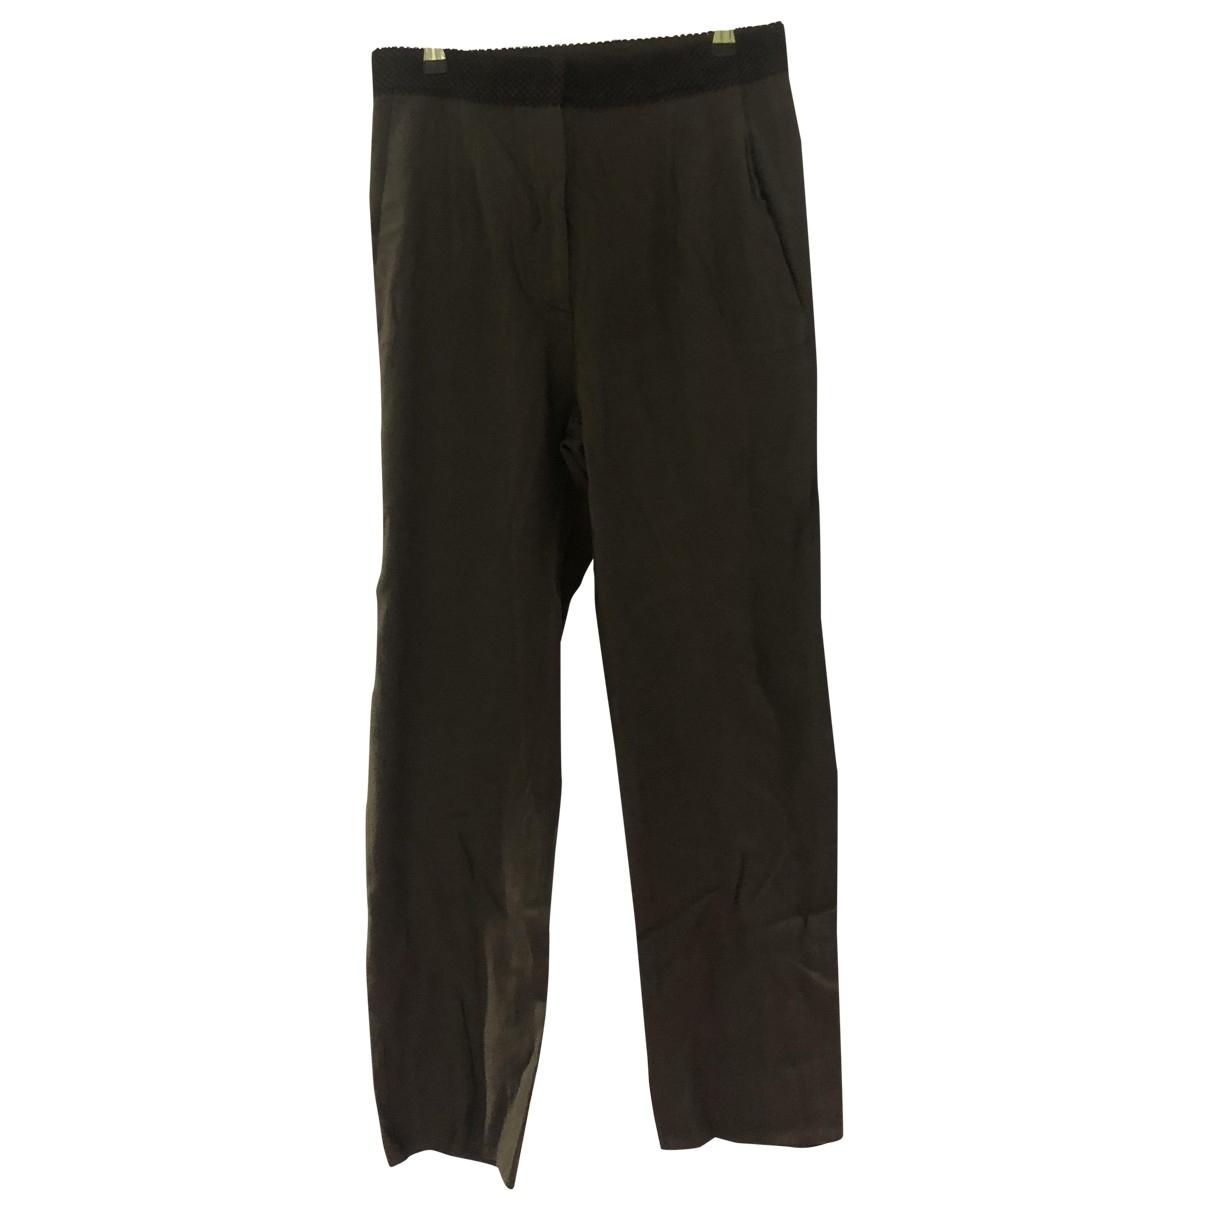 Mm6 \N Khaki Cloth Trousers for Women 42 IT